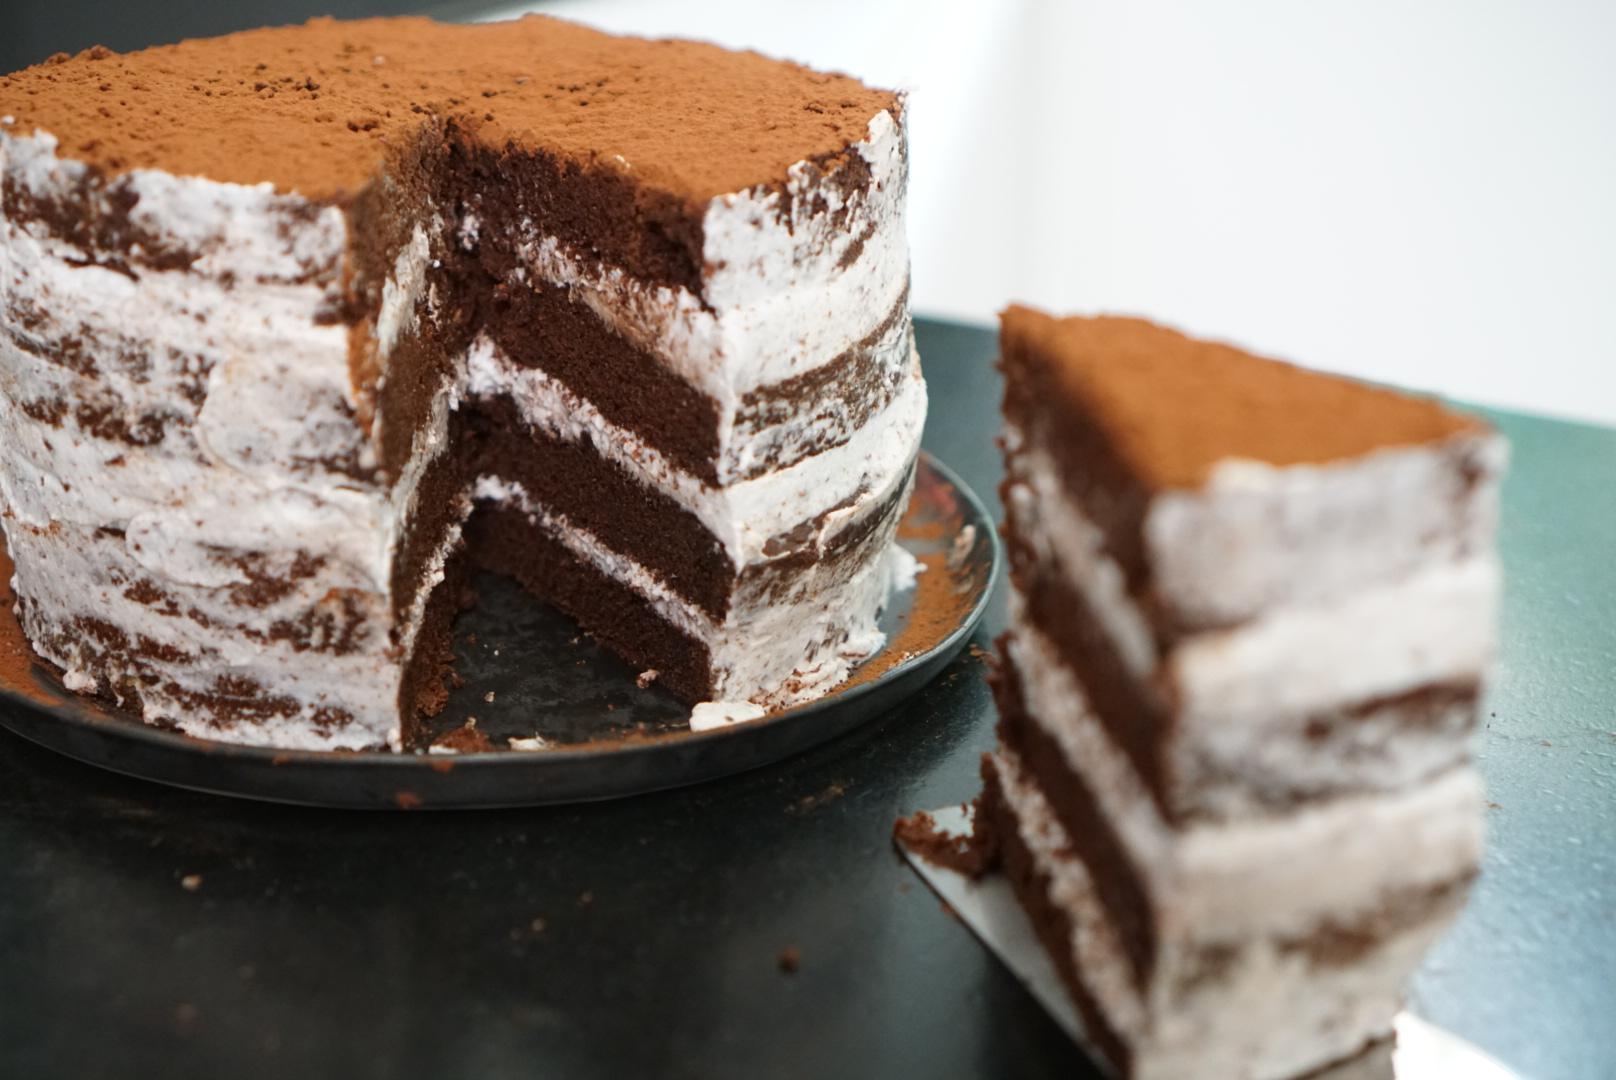 Recette Du G Teau Chocolat Vegan Tage Ou Layer Cake